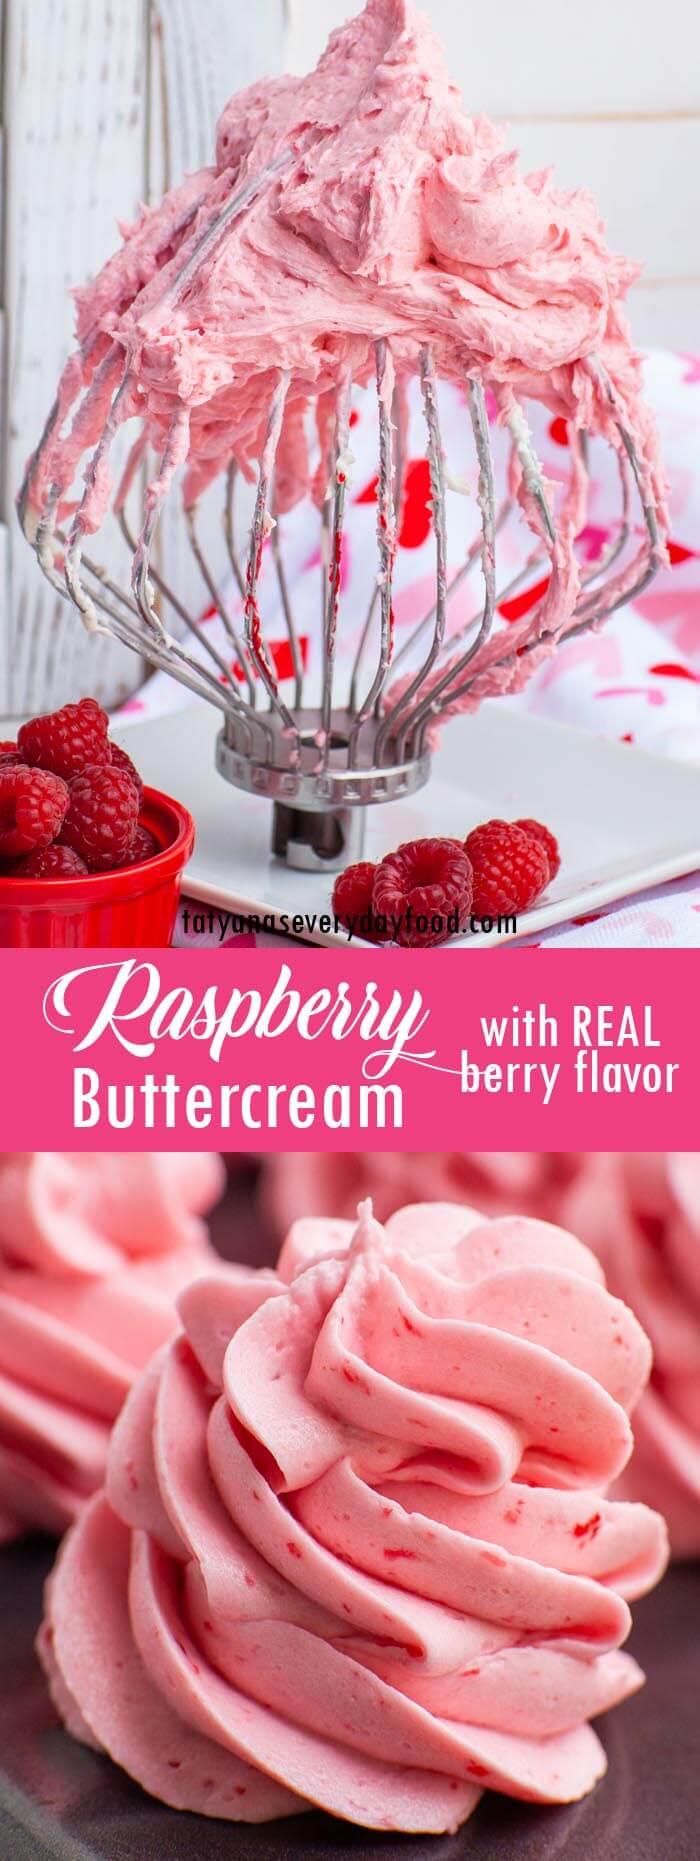 Raspberry Buttercream video recipe